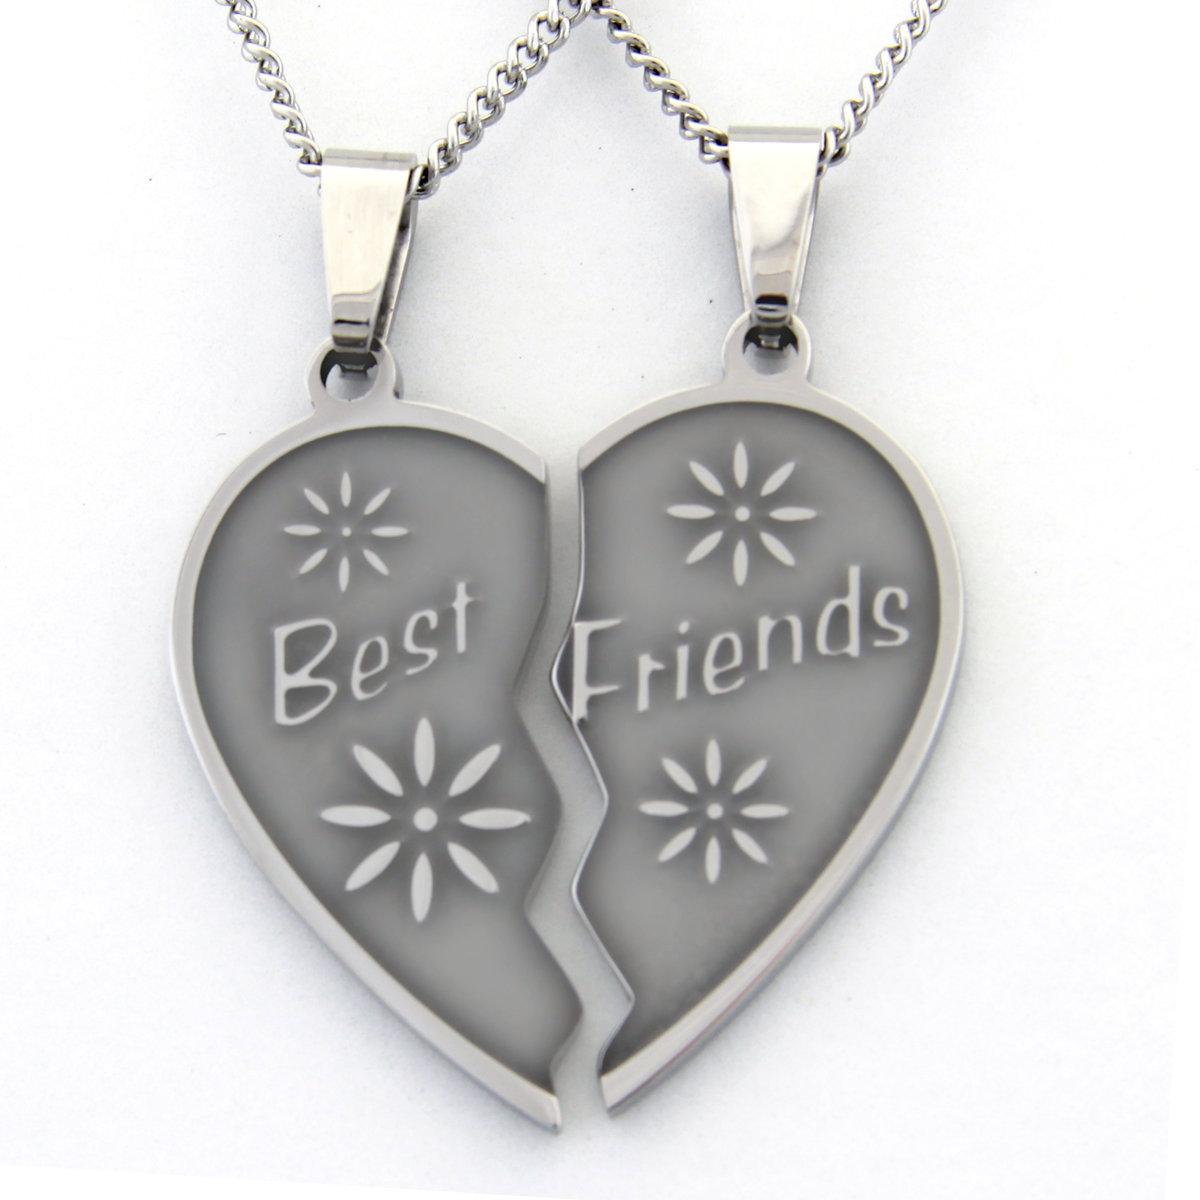 Талисманы дружбы картинки